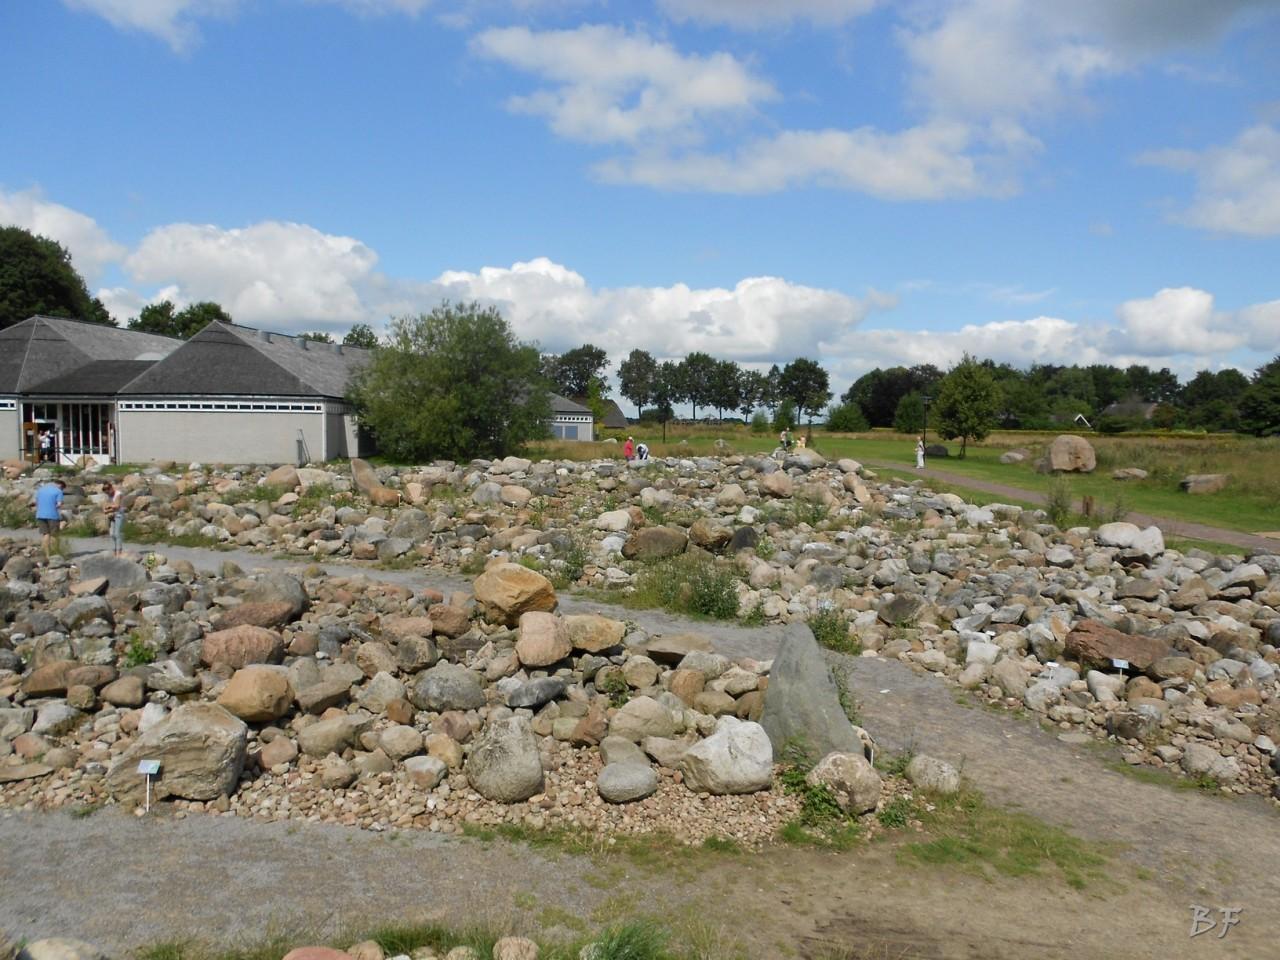 Hunebedden-Dolmen-Megaliti-Groeningen-Drenthe-Paesi-Bassi-64